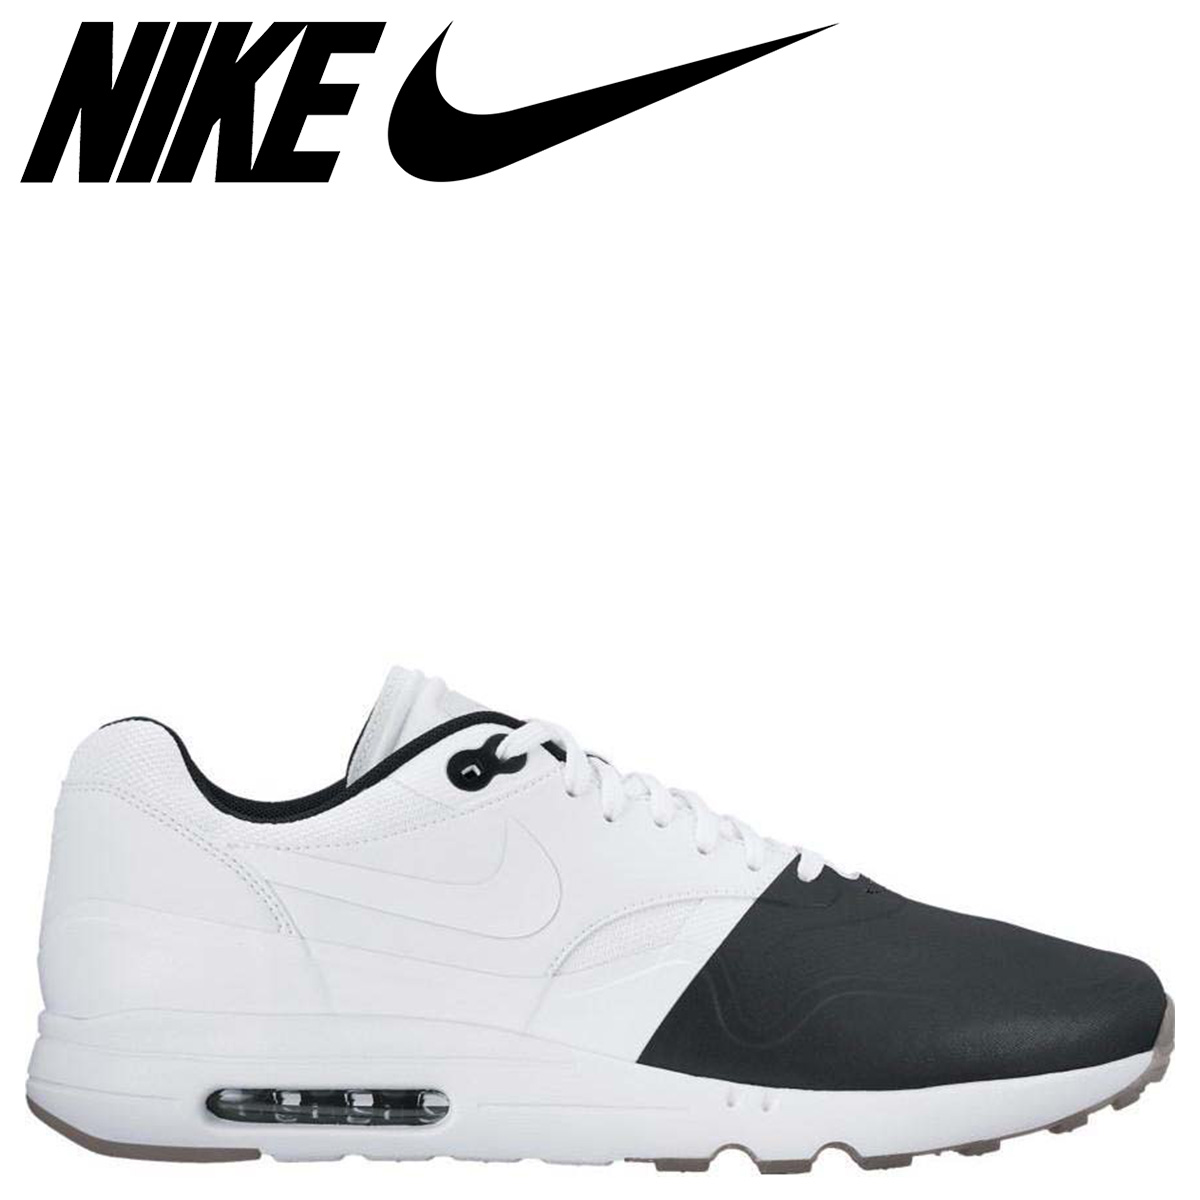 Amazon | (ナイキ) Nike Air Max 1 Ultra 2.0 SE 875845 001